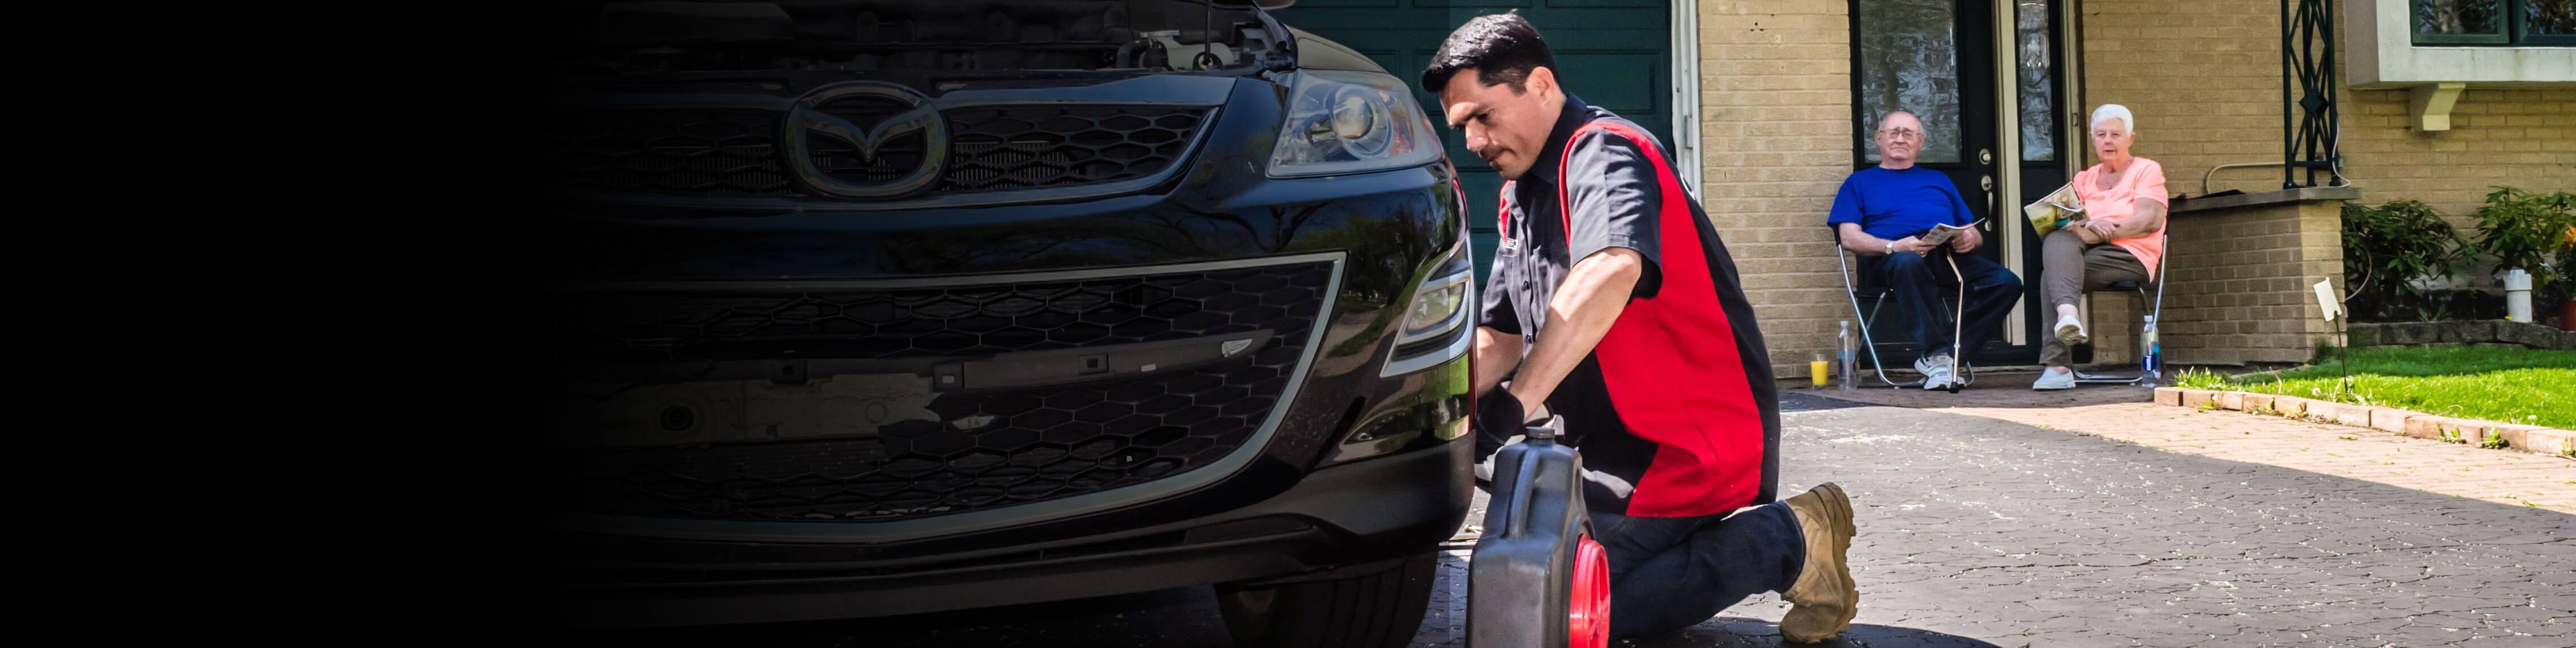 Mobile Mechanics Barrington Mobile mechanic, Auto repair